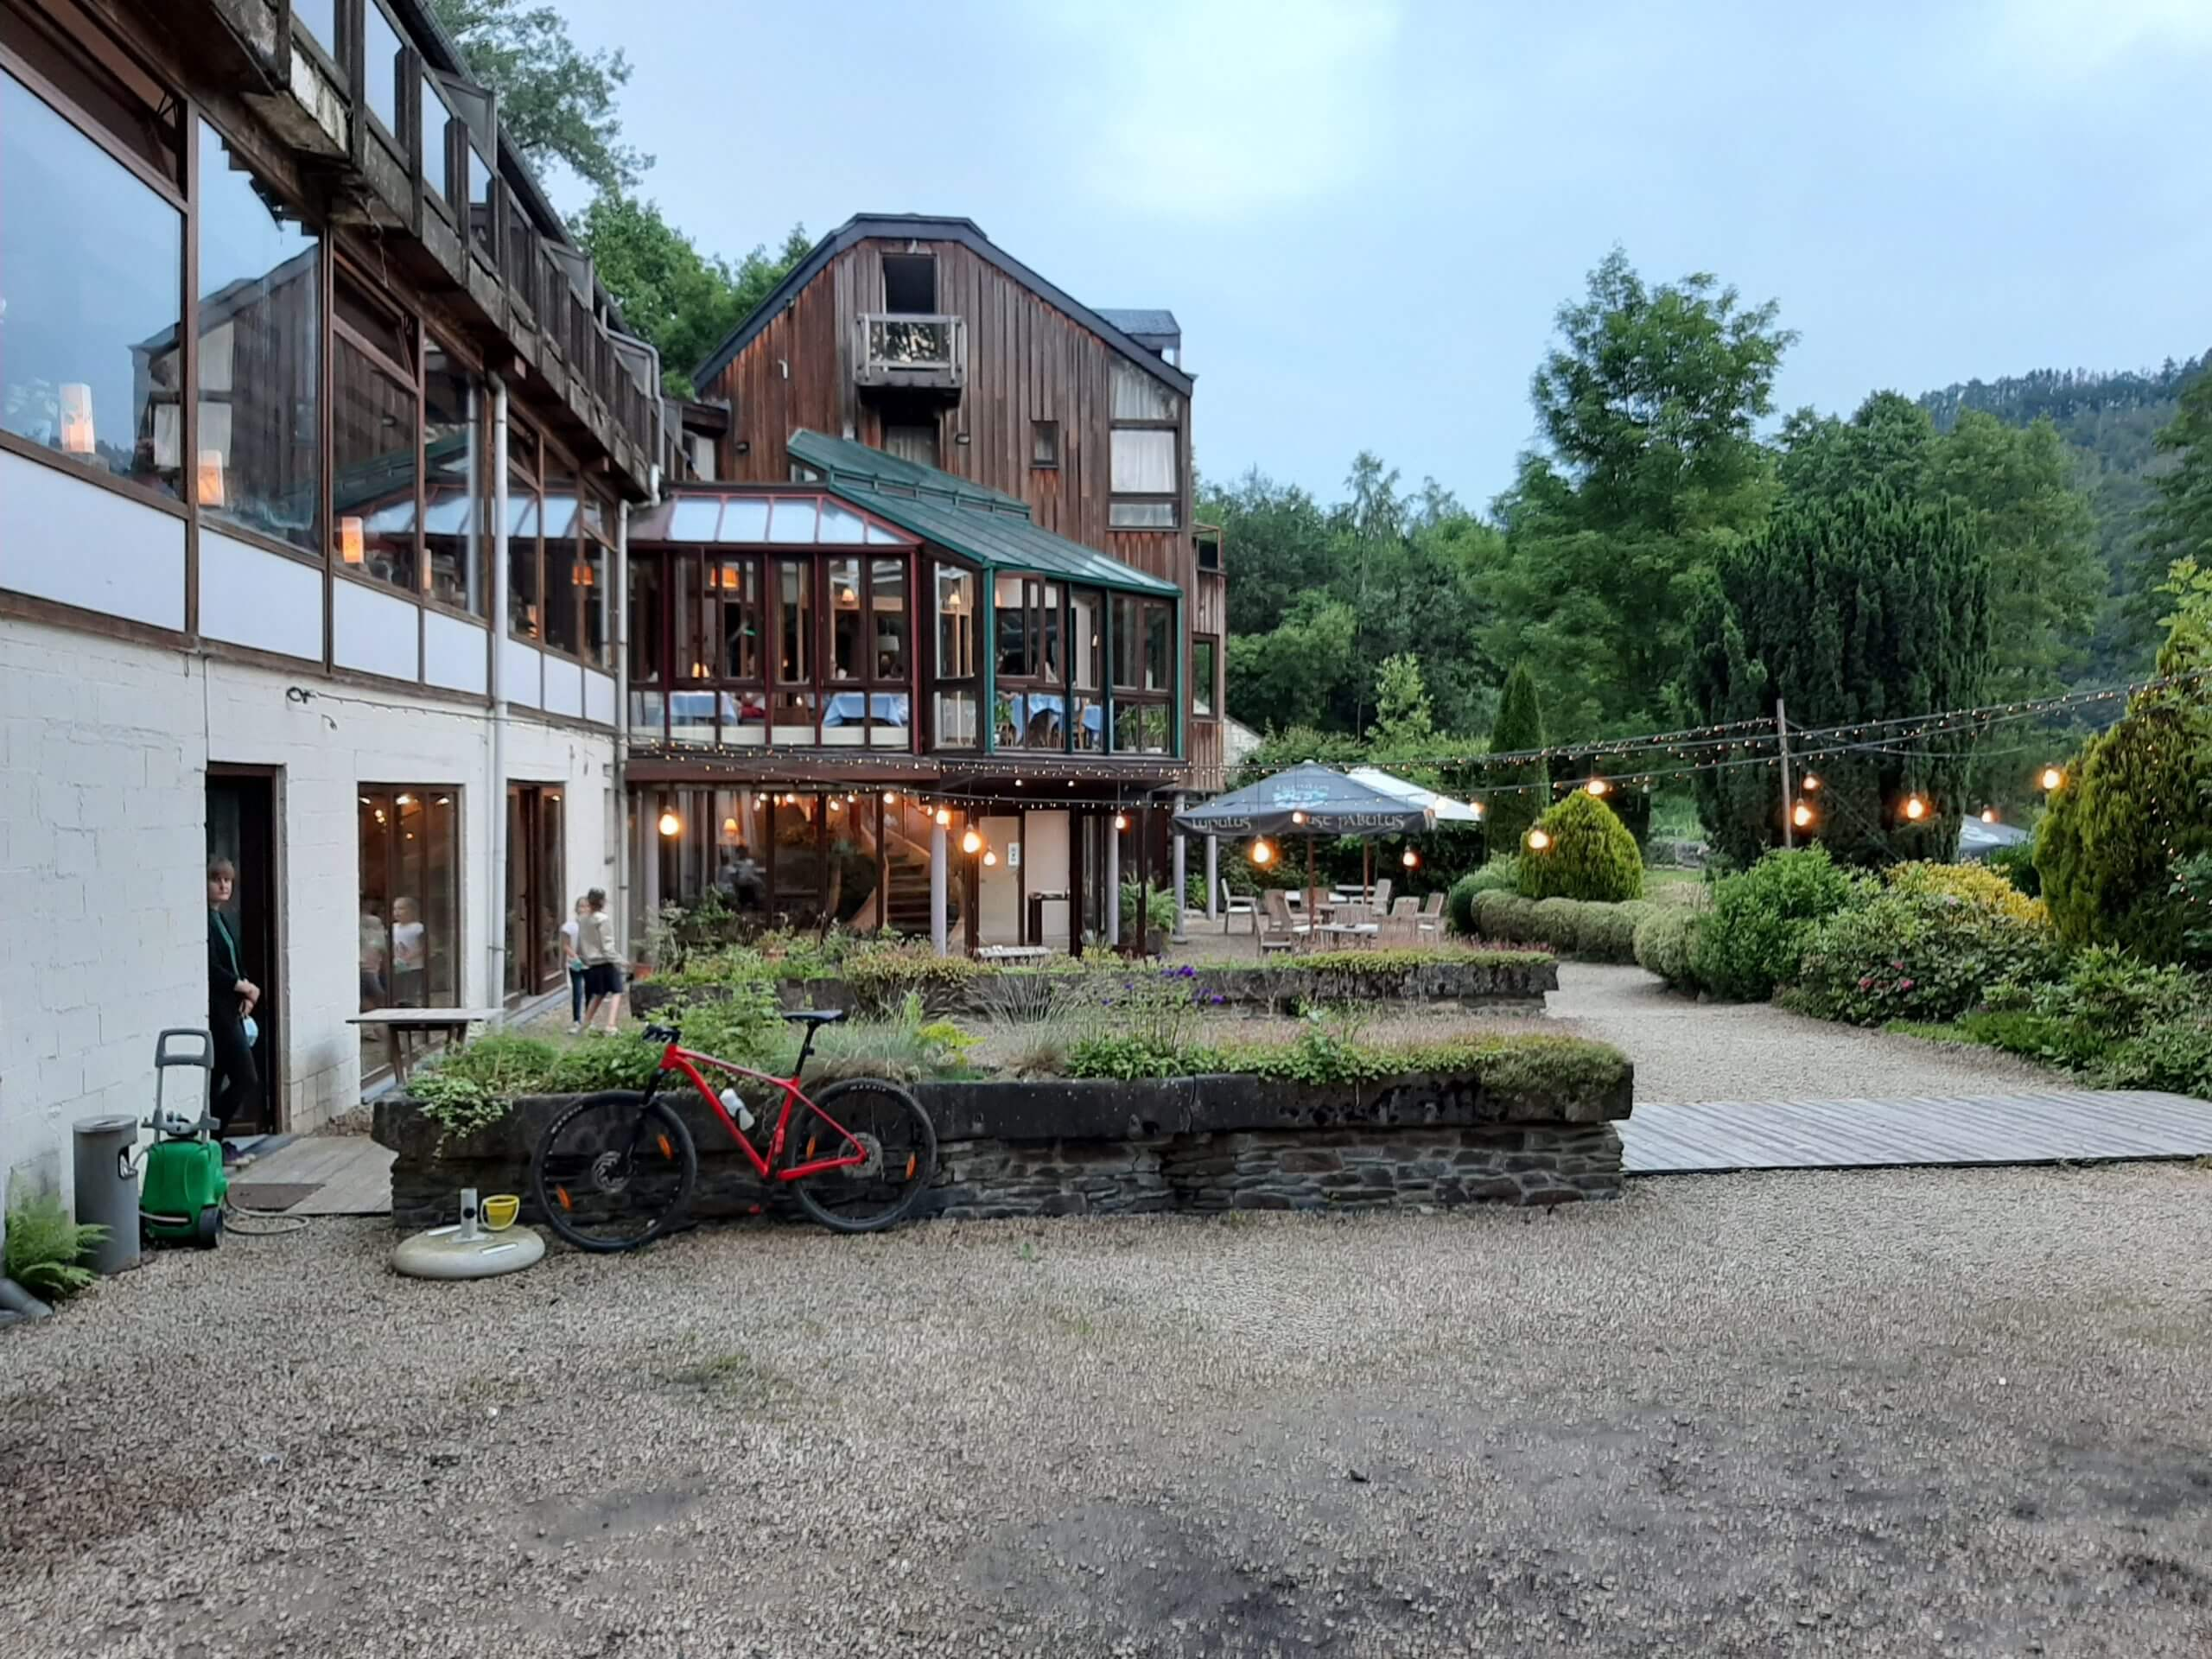 Hostellerie la Claire Fontaine La Roche-en-Ardenne jardin